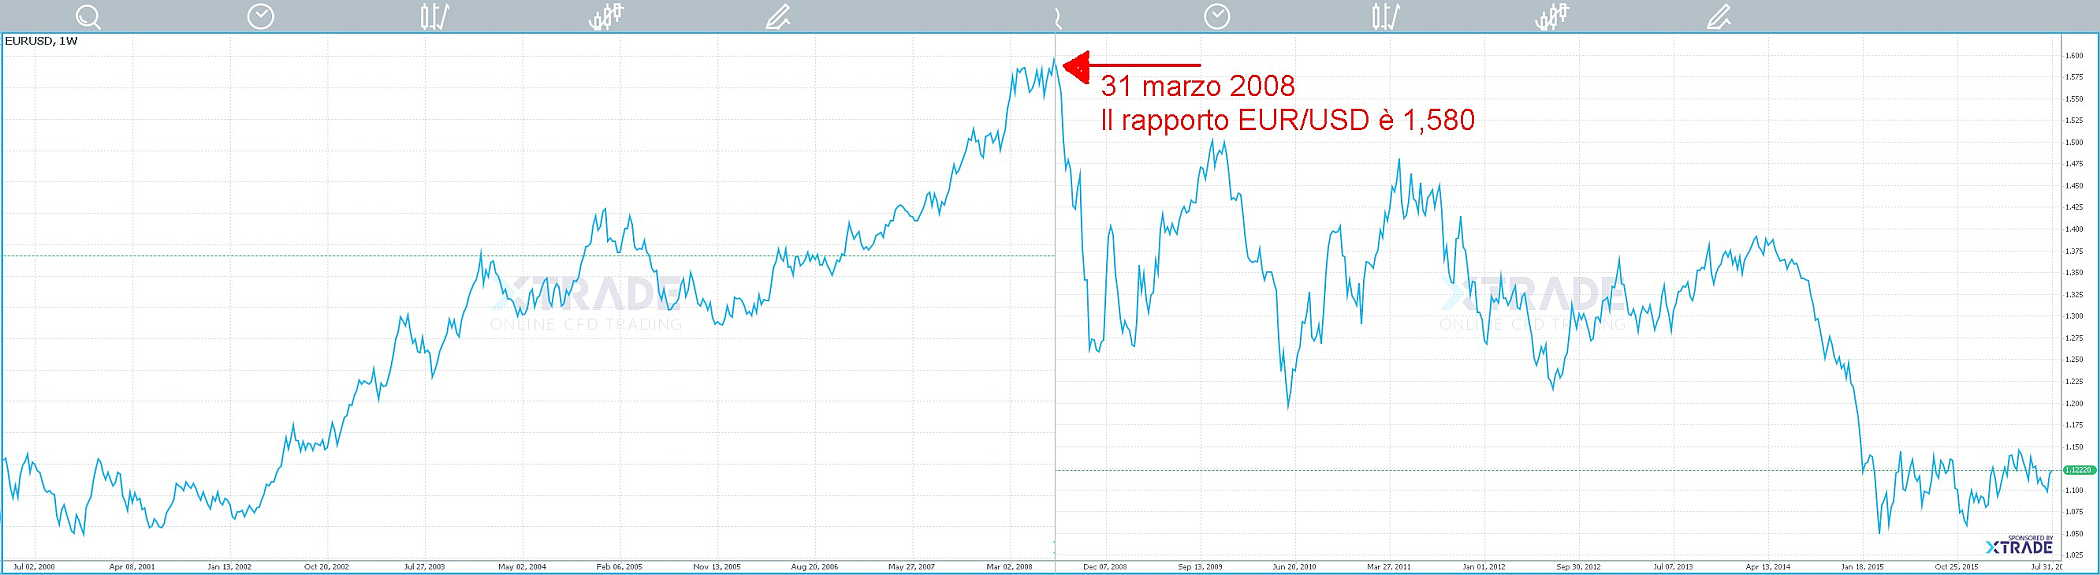 http://www.universoforex.it/foto/storia_euro-dollaro.jpg